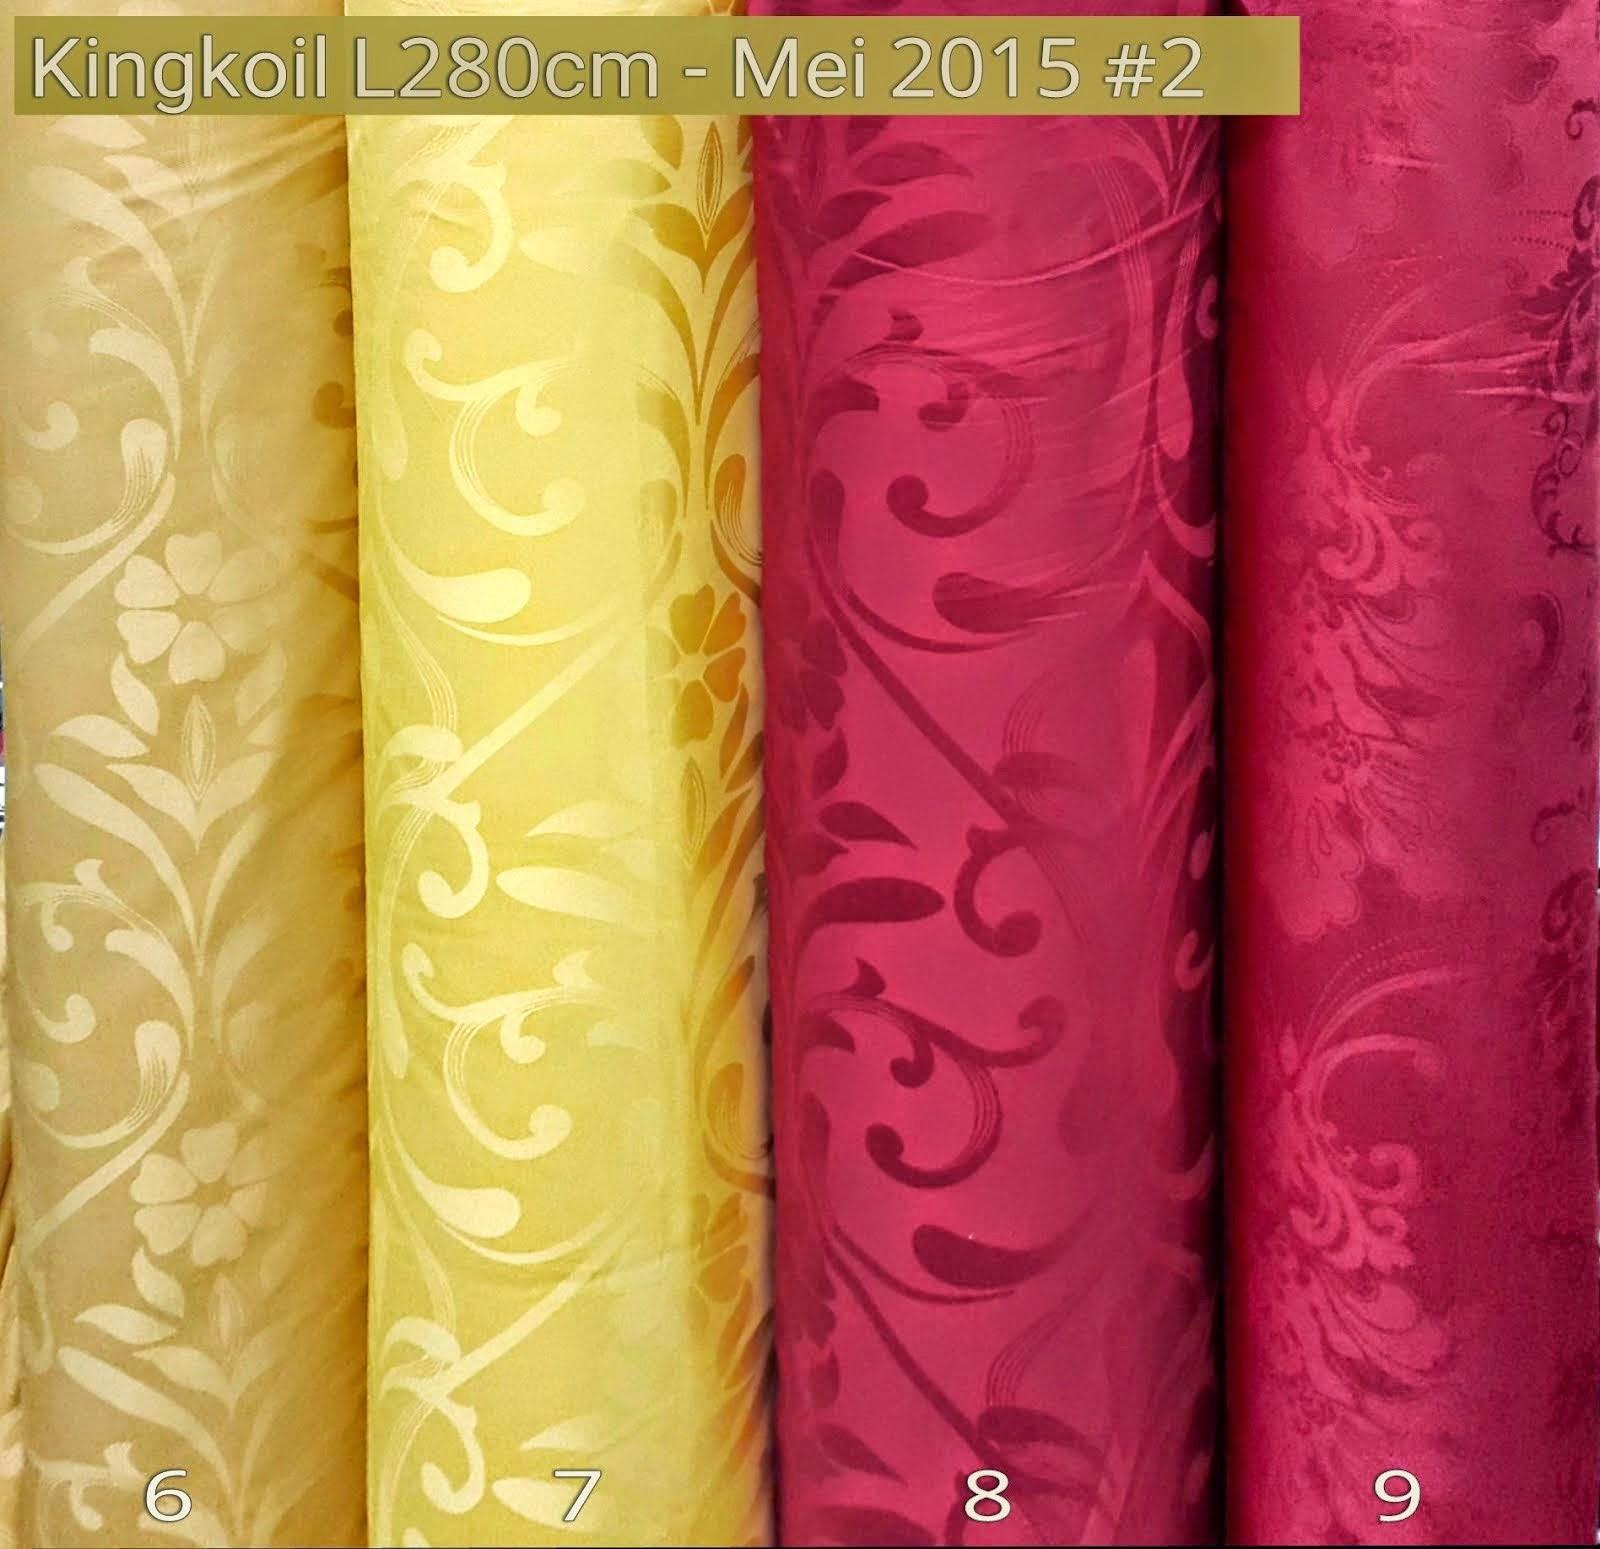 Kingkoil Periode Mei 2015